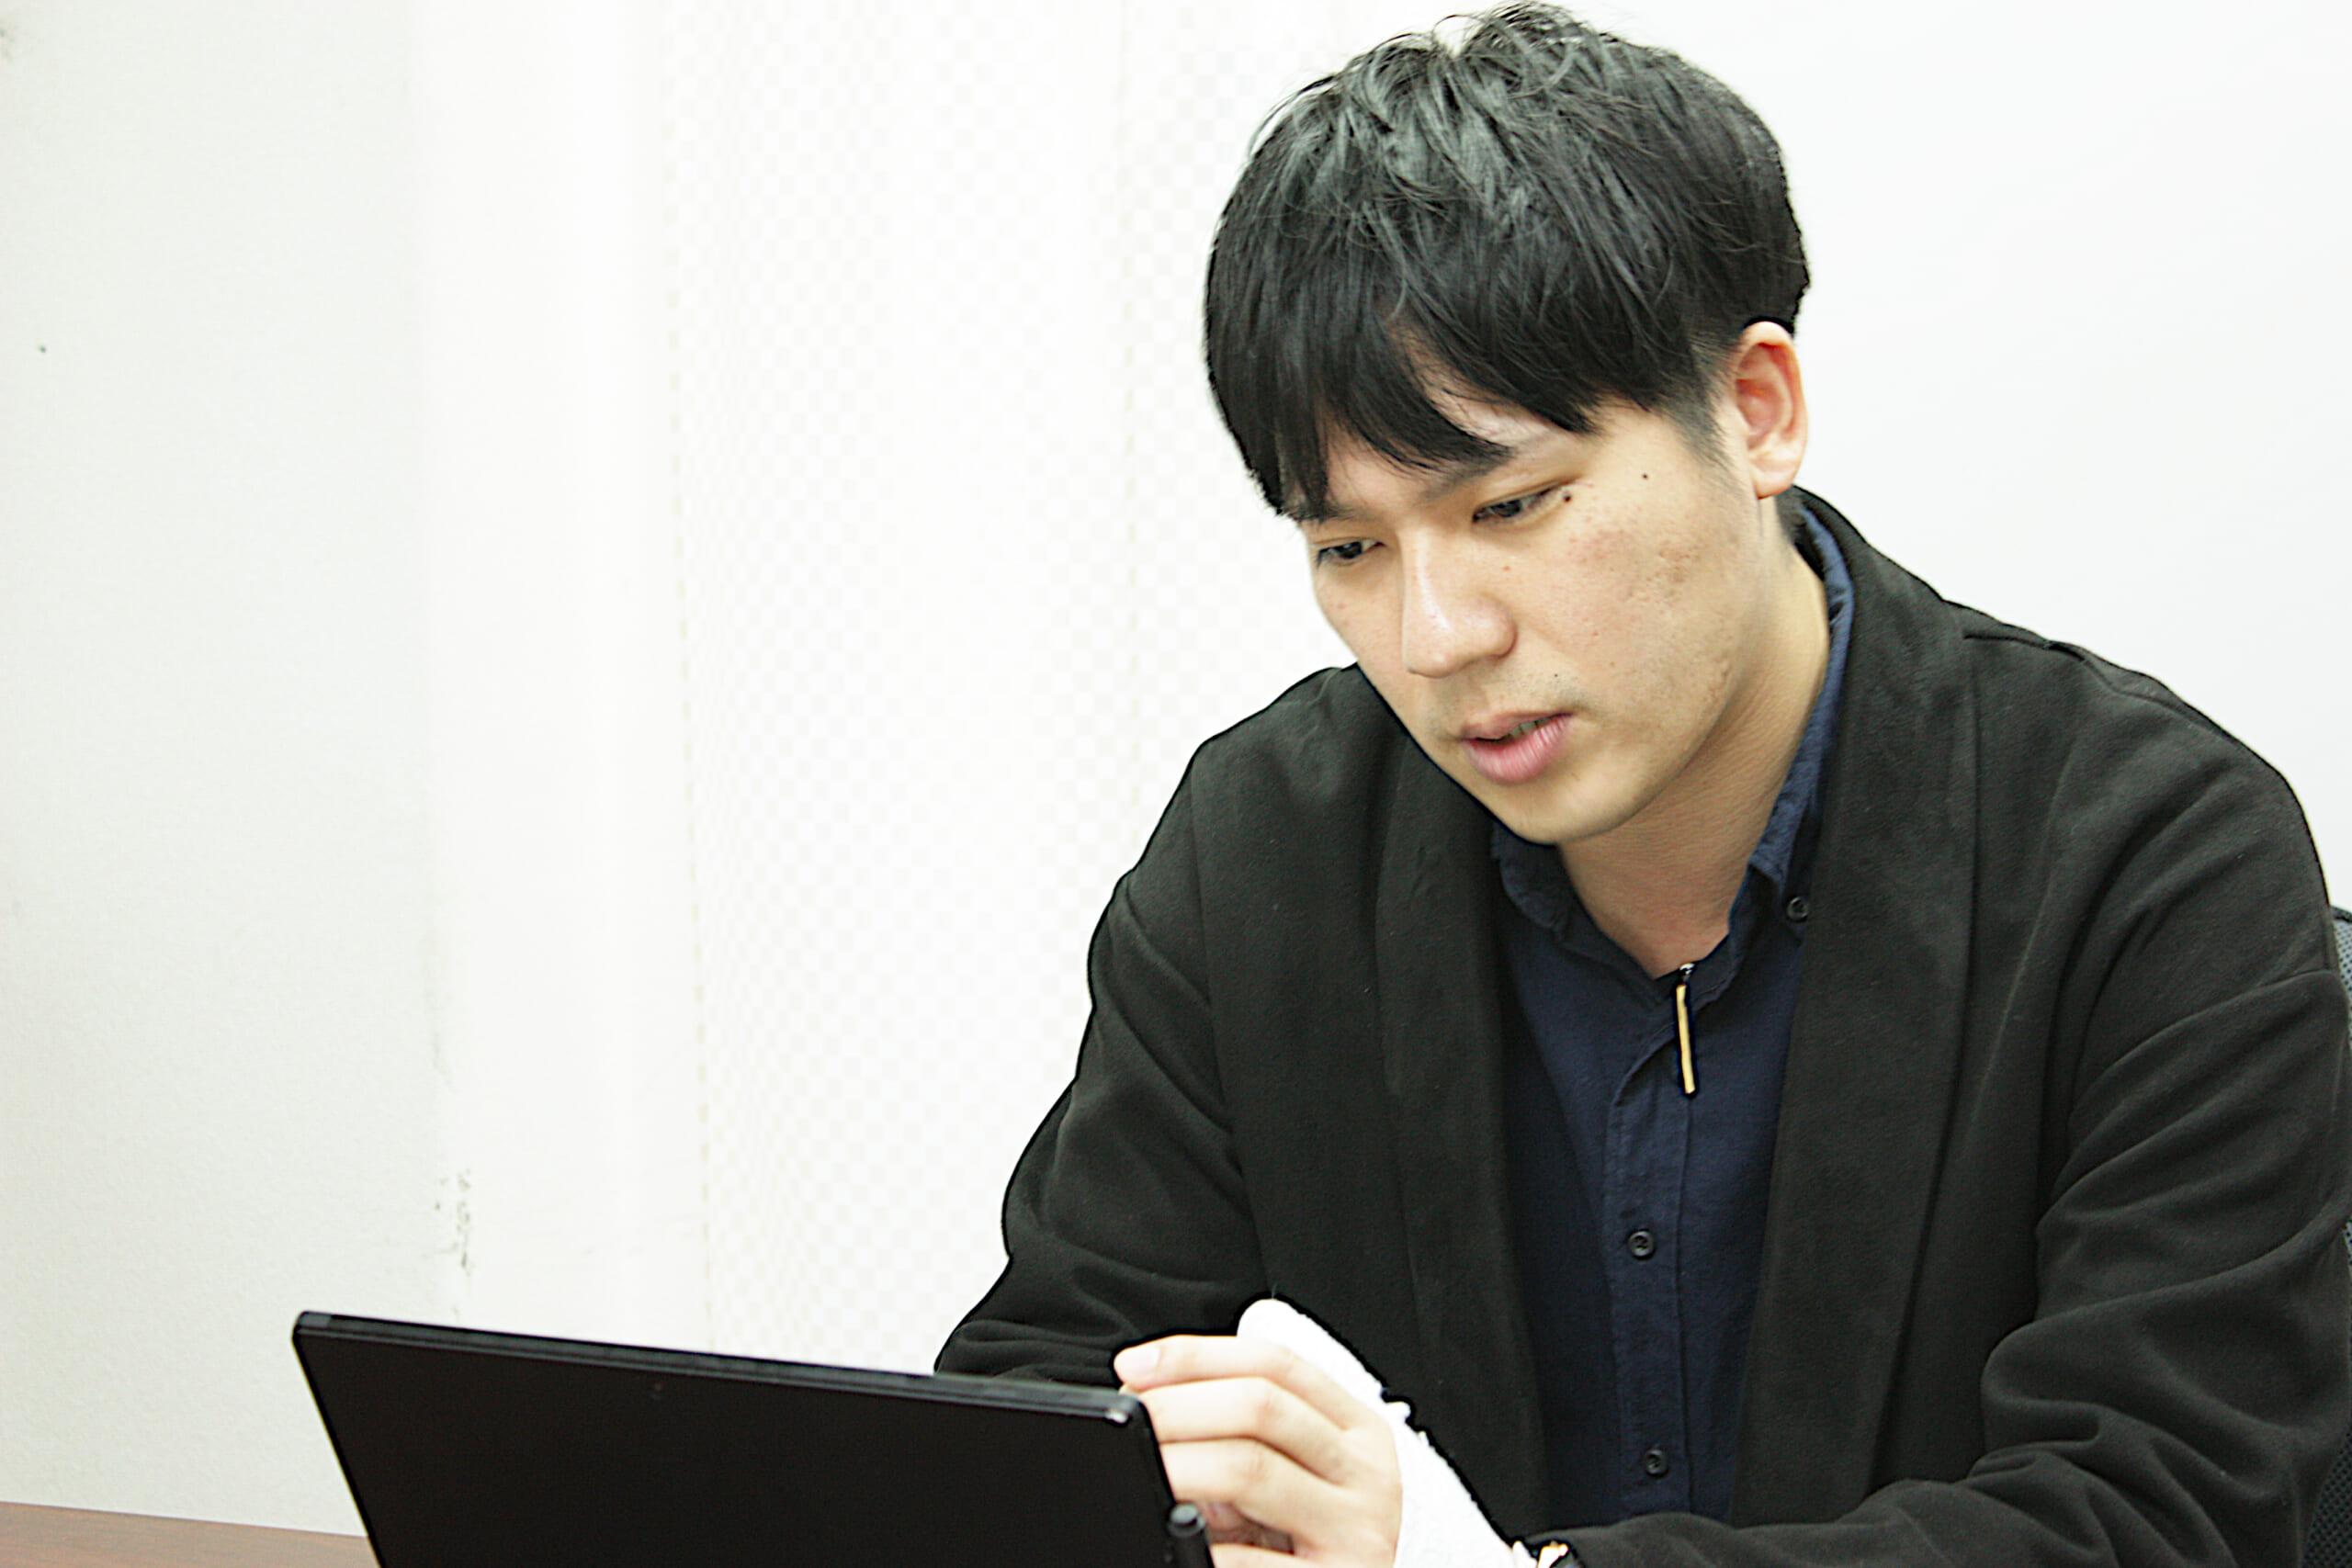 【BlueBean導入事例】株式会社ファーストユニオン 日與川様